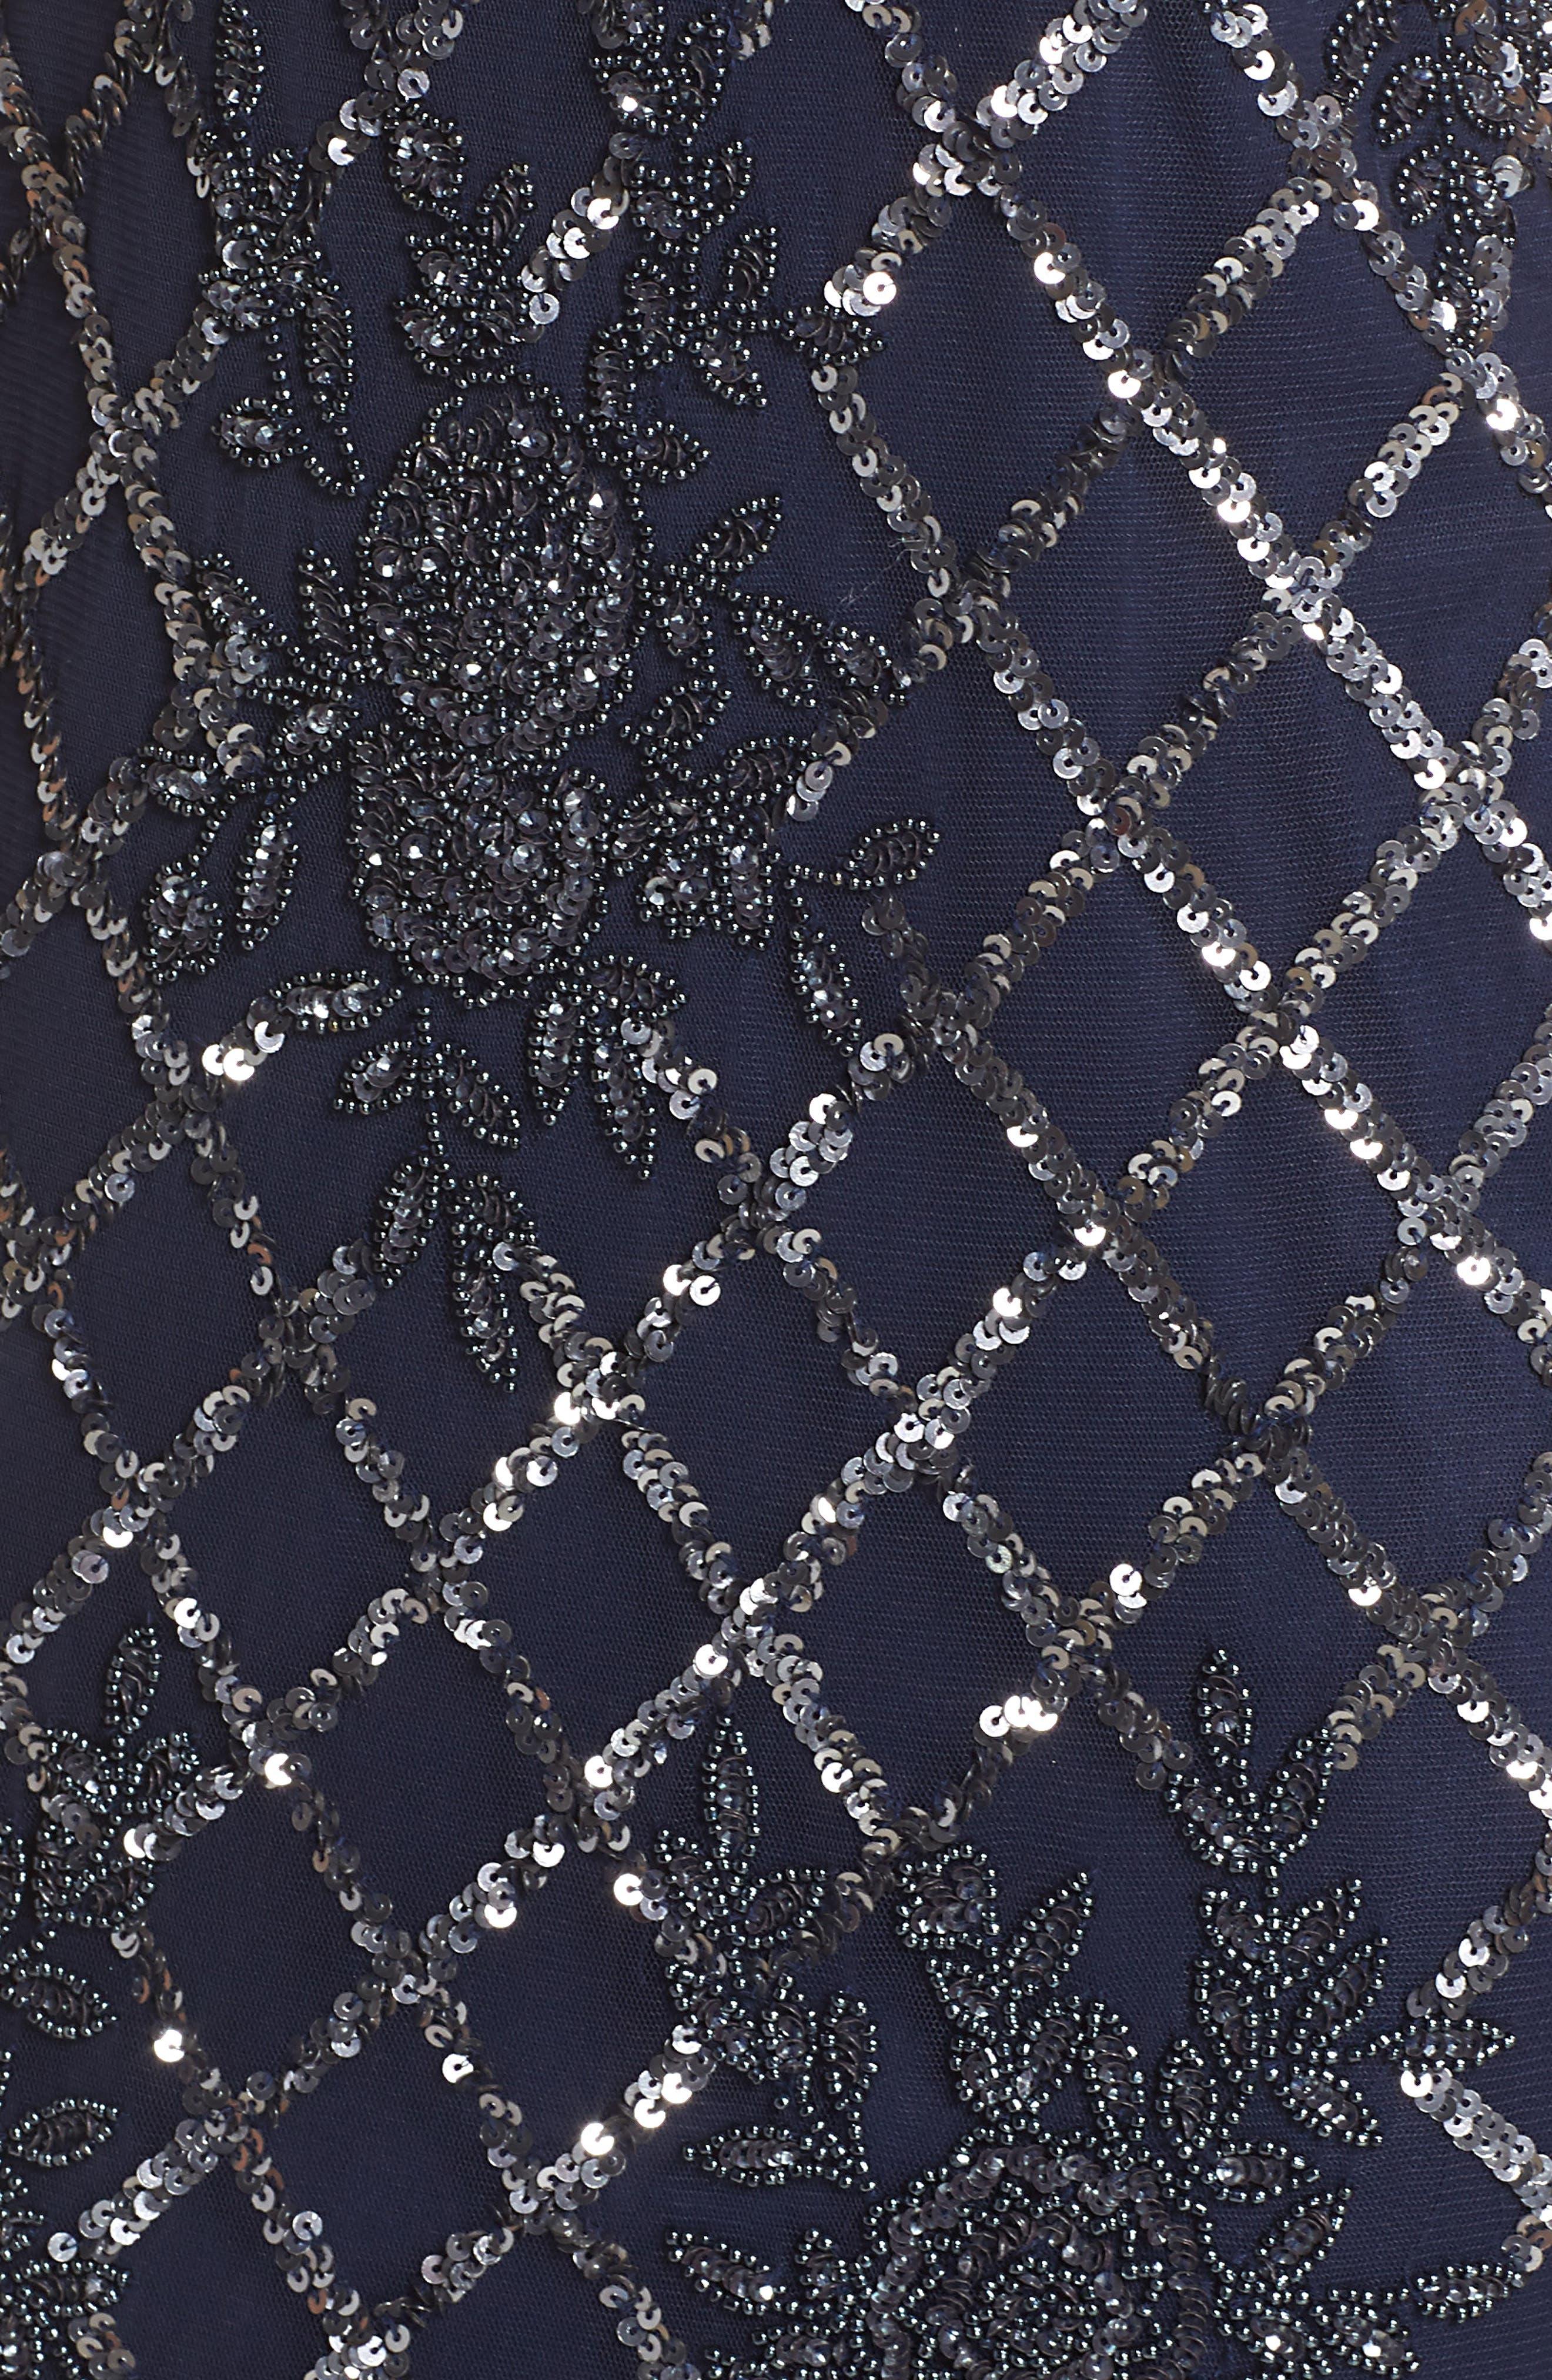 Beaded Sheath Dress,                             Alternate thumbnail 5, color,                             410